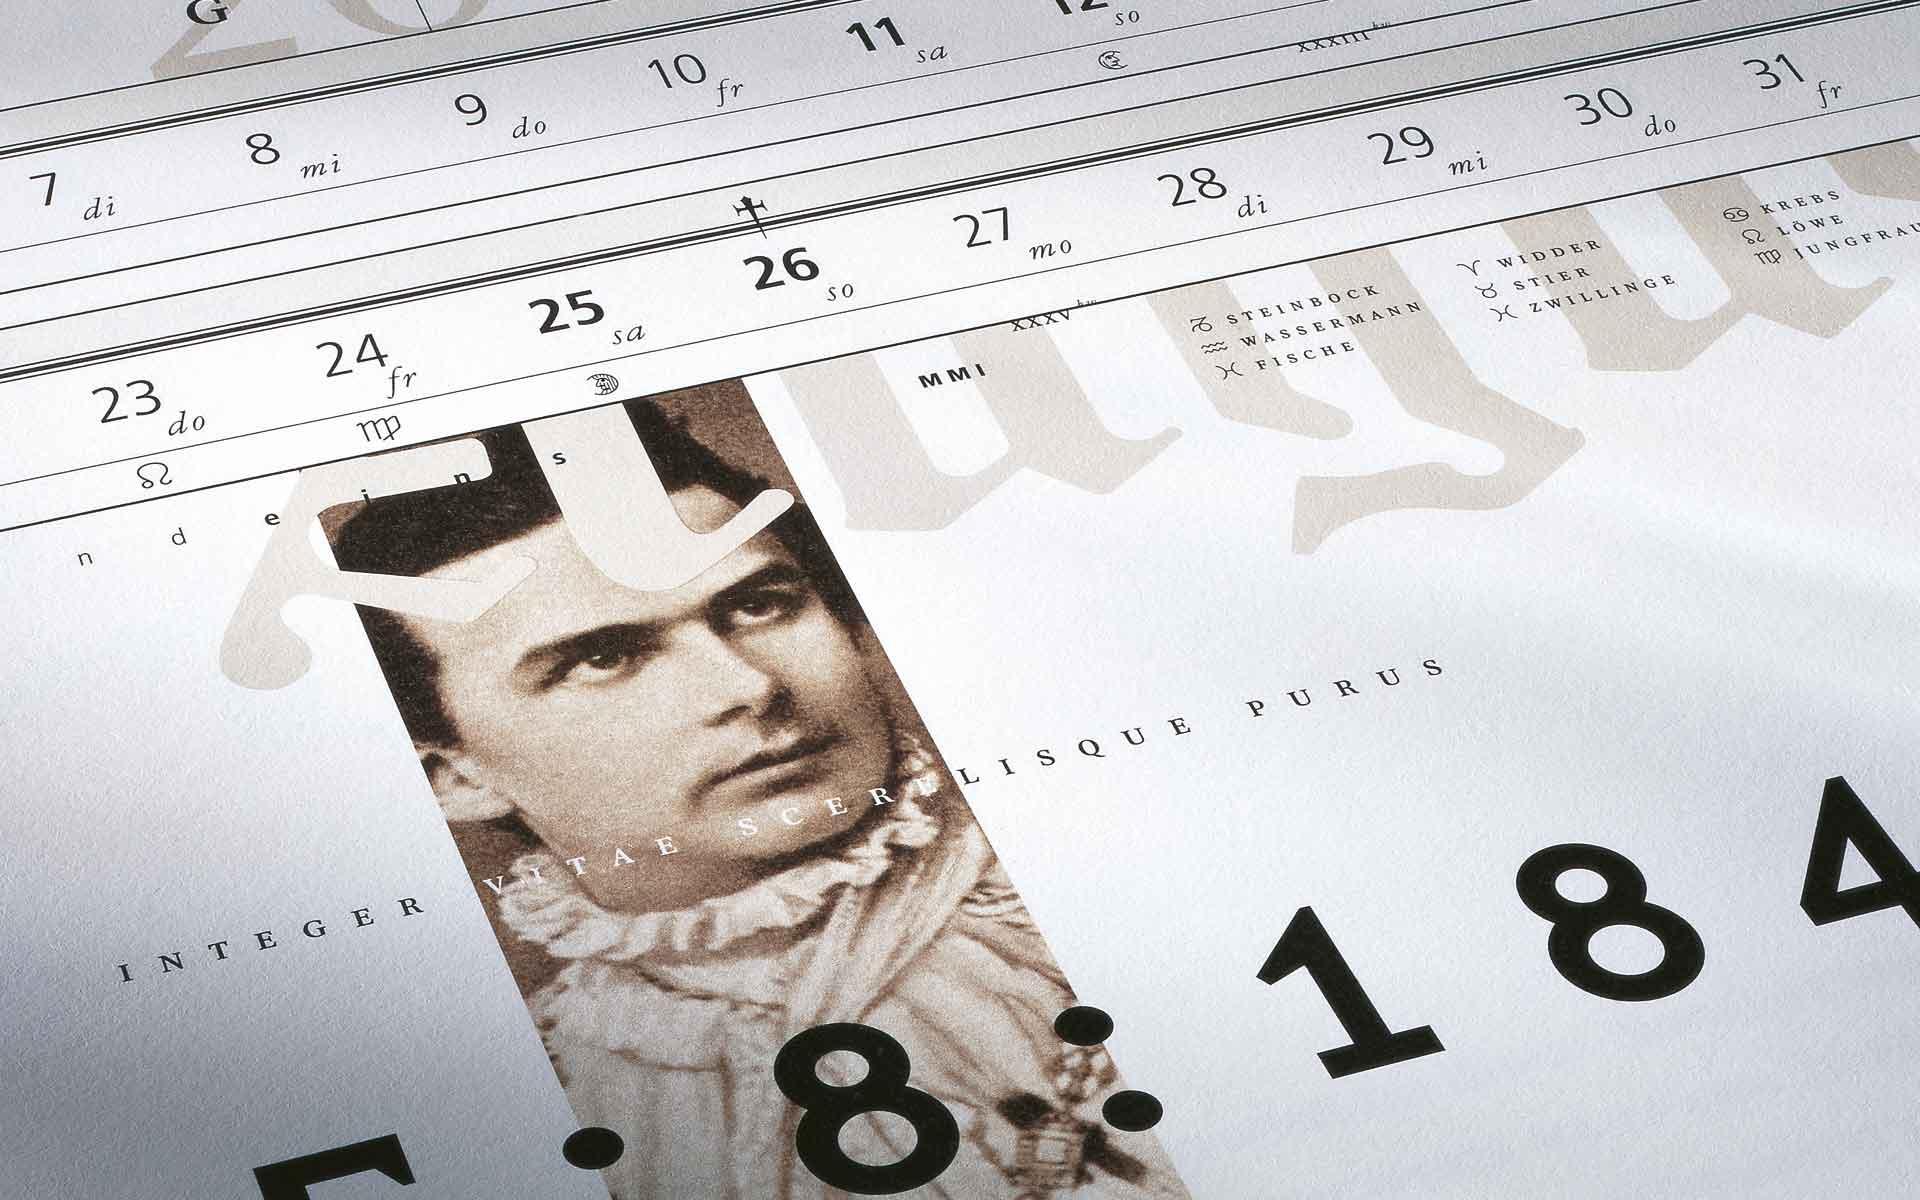 Münchener Hypothekenbank, Kalender »König Ludwig II. von Bayern«. Kalenderblatt August.